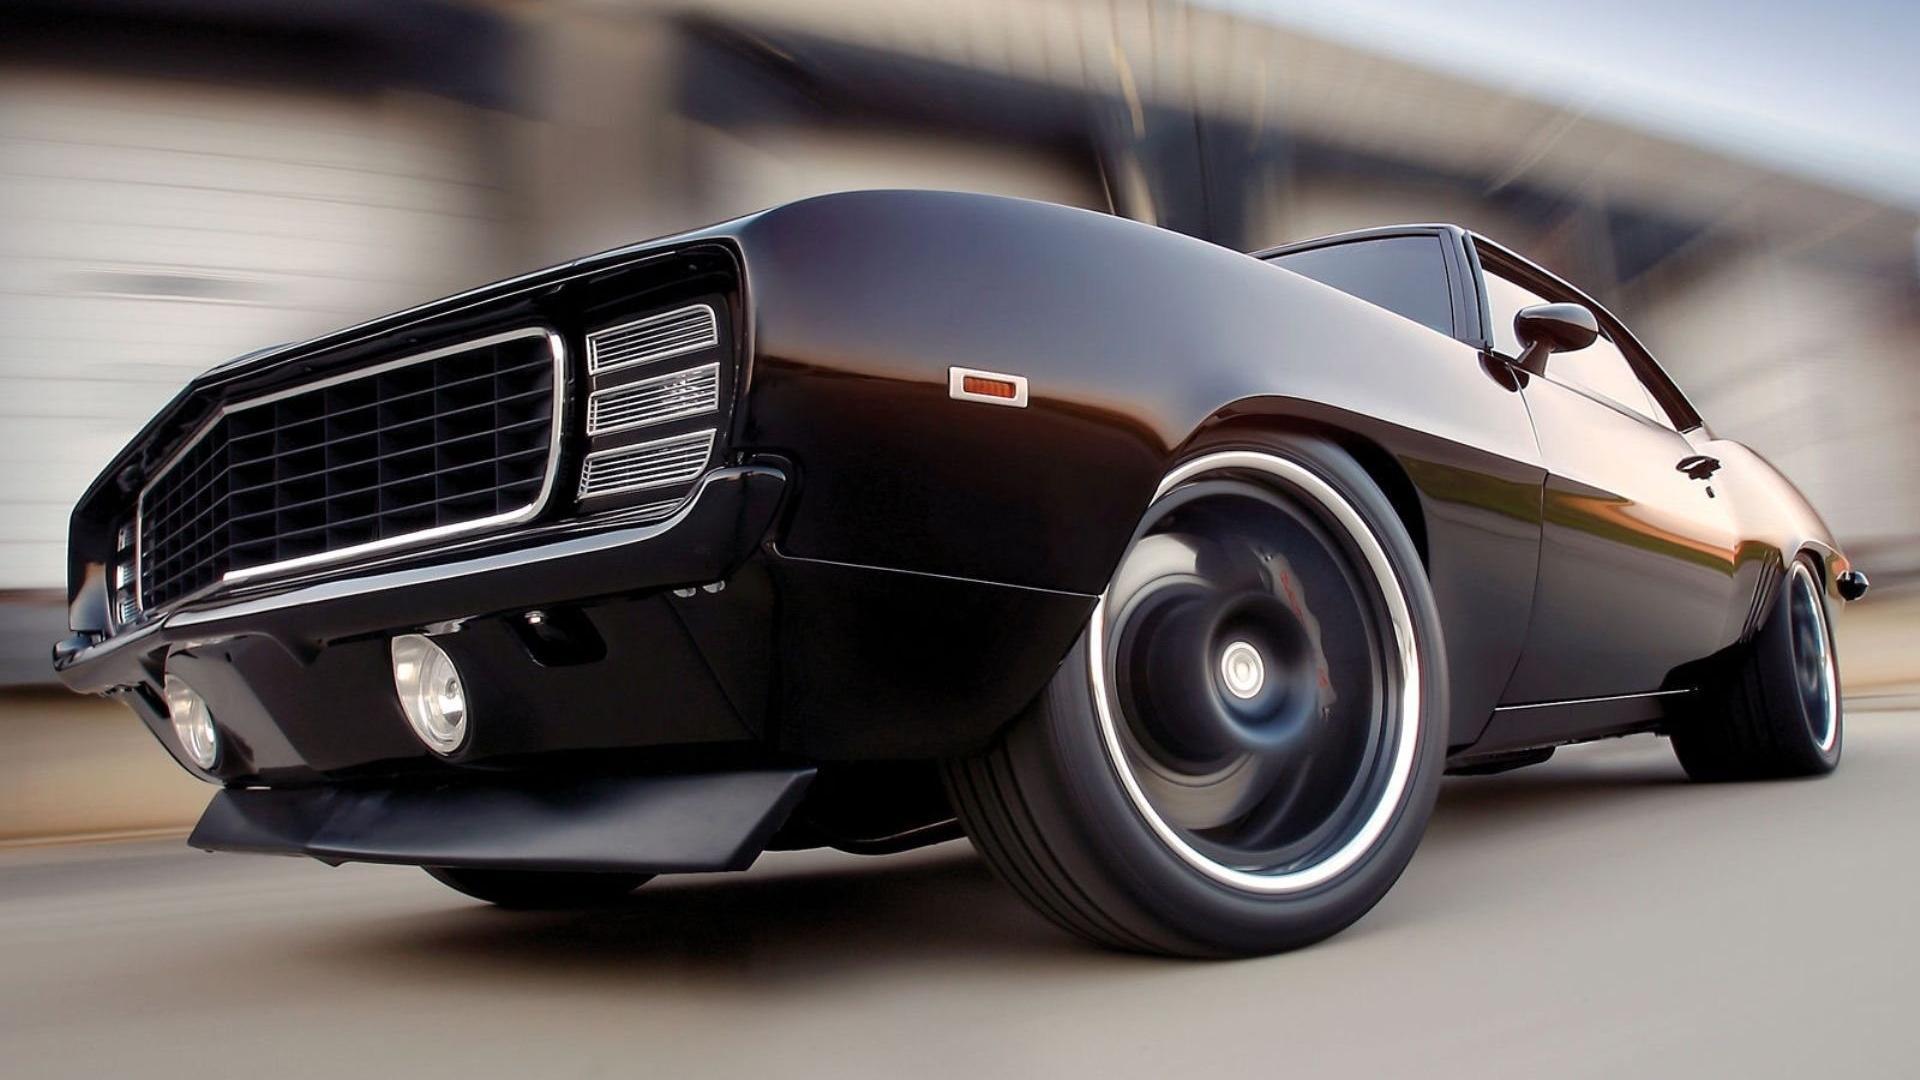 Black 69 Chevrolet Camaro Wallpaper   HD 1920x1080